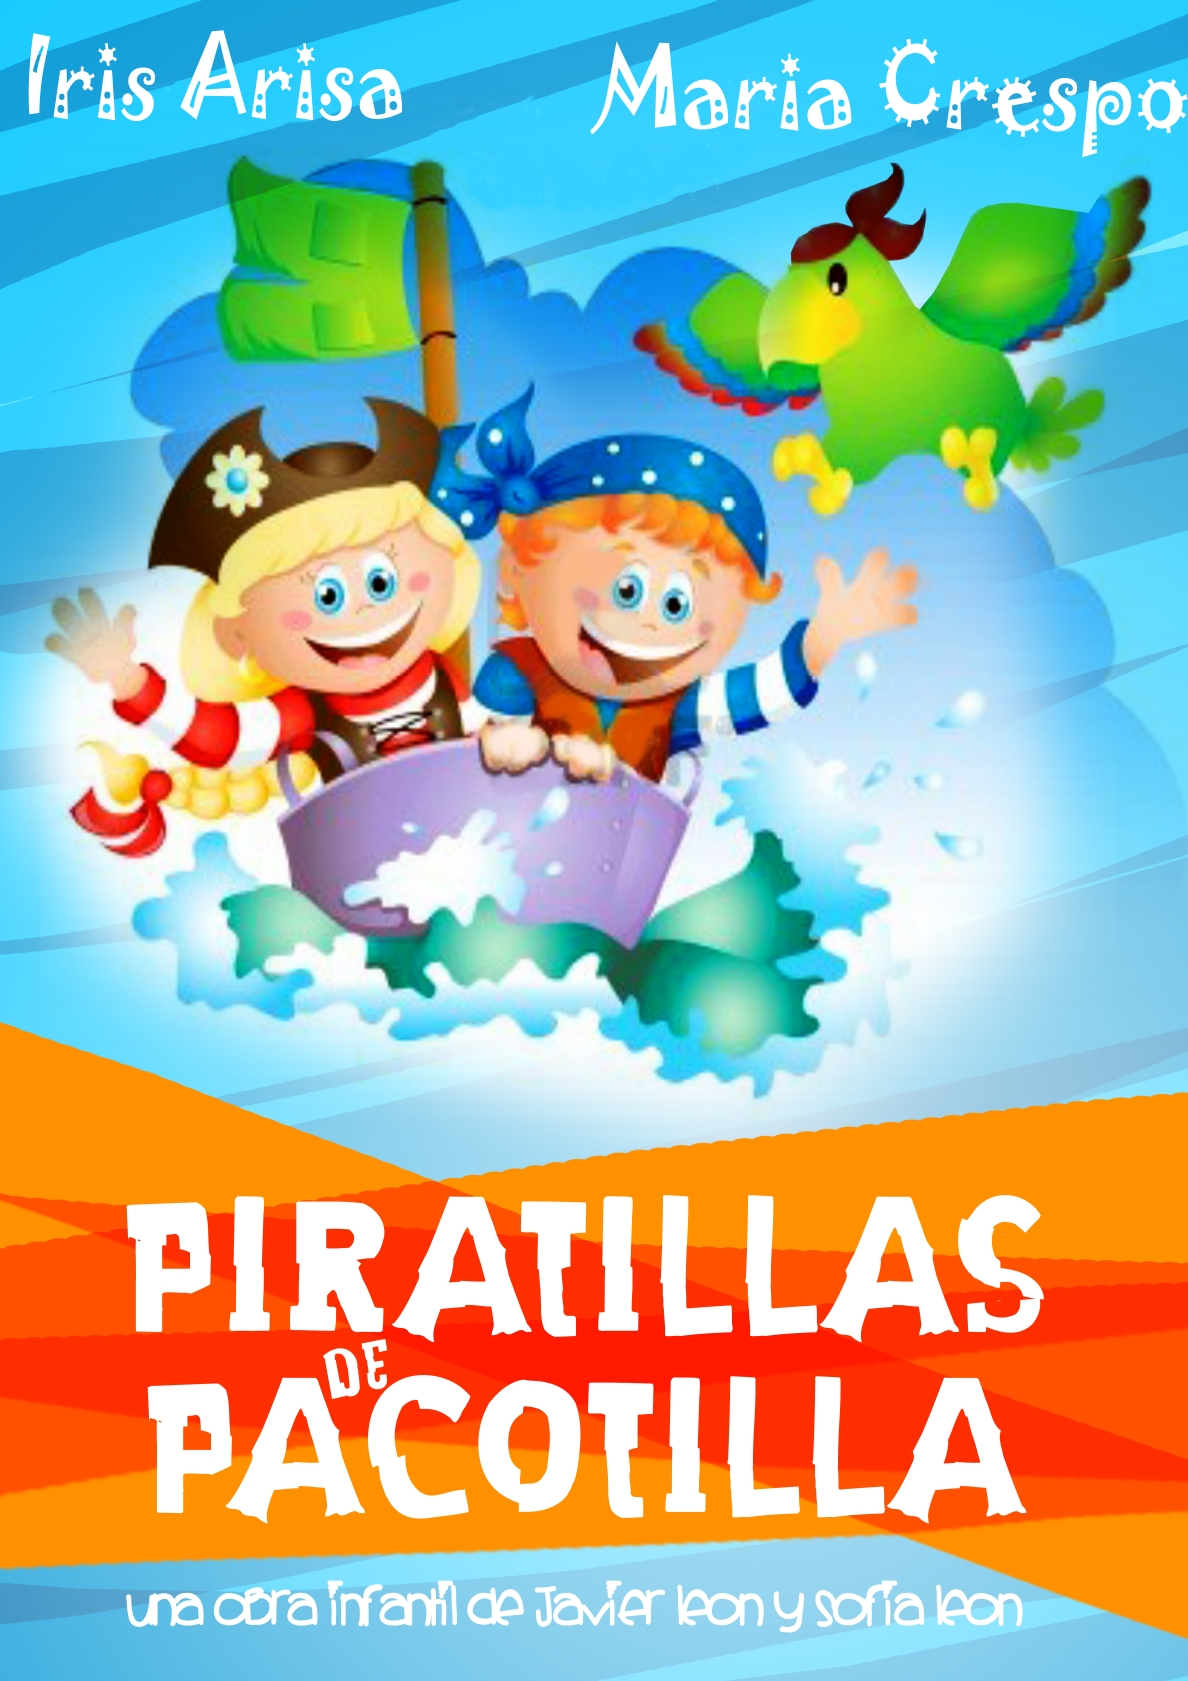 PIRATILLAS DE PACOTILLA